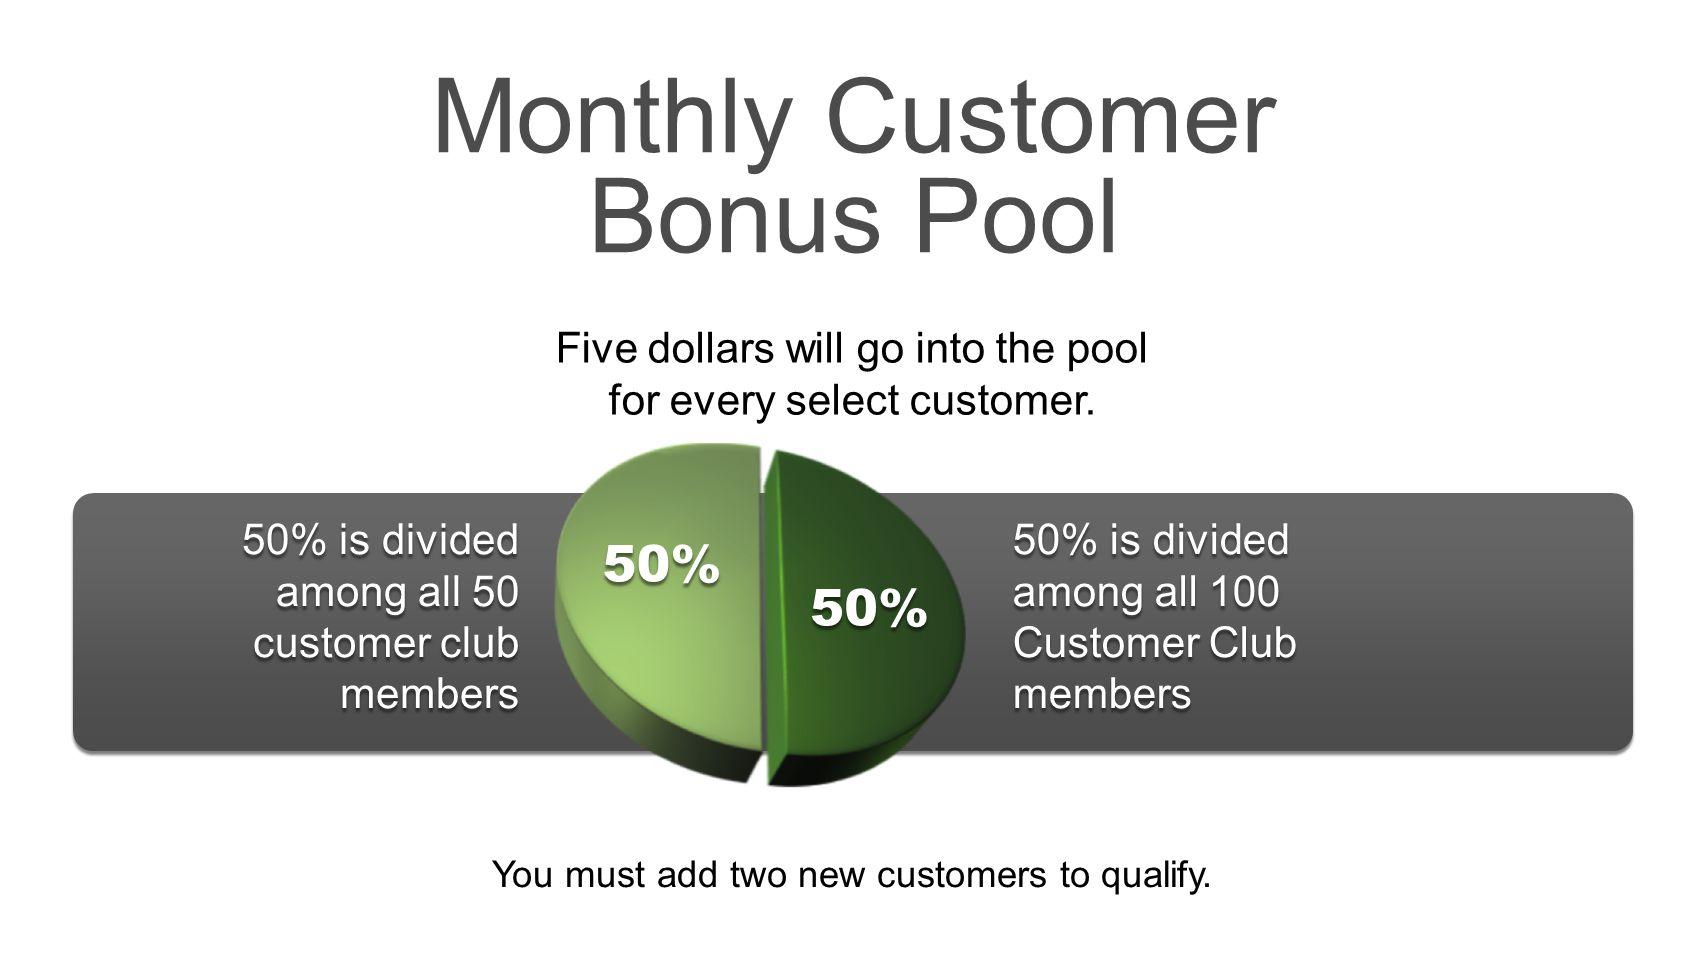 Monthly Customer Bonus Pool